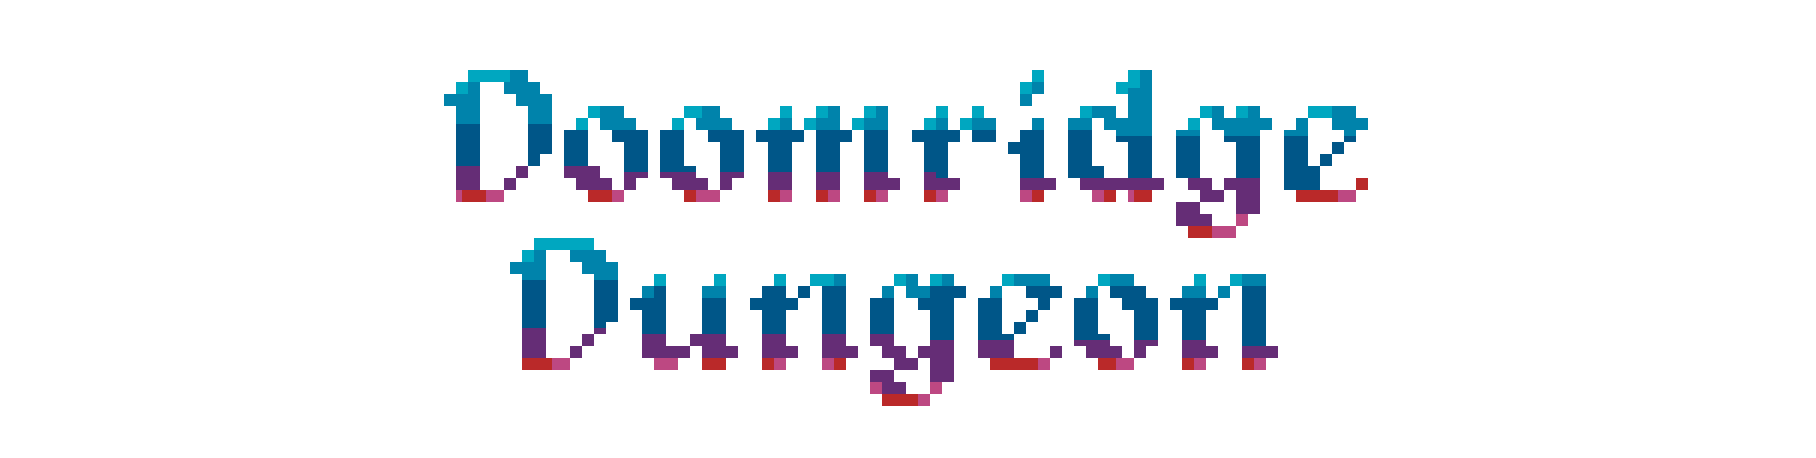 doomridge-dungeon-demo